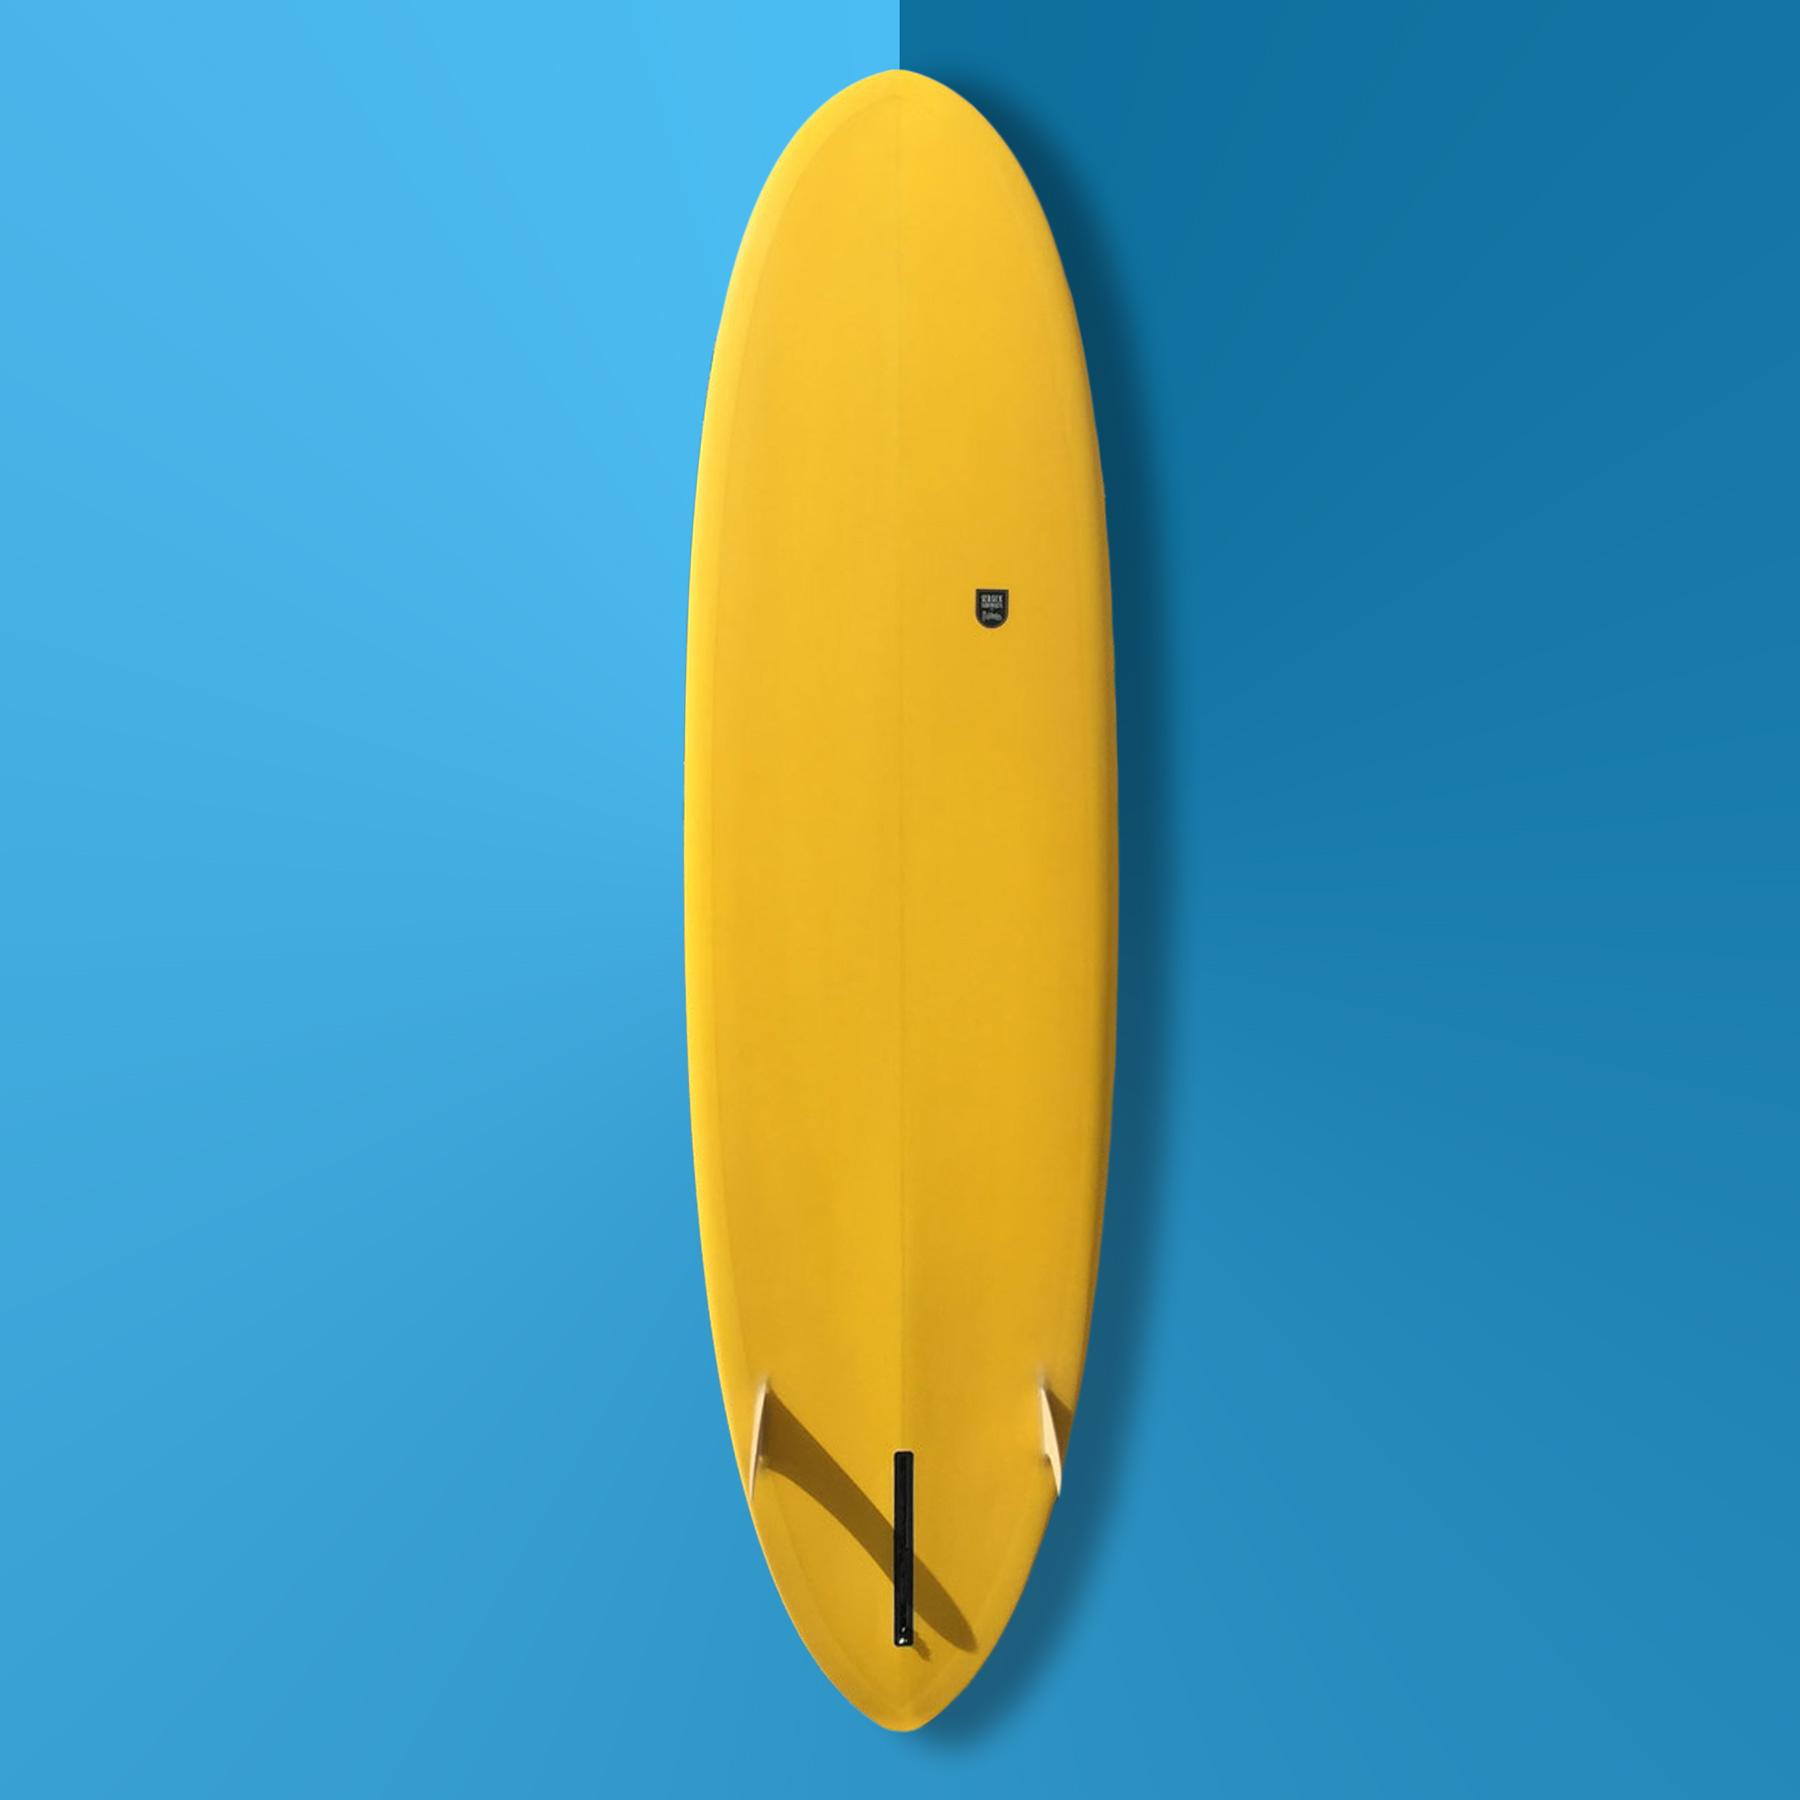 Sea Sick Surf Sea Sick Surf Classic Egg 7'3 // SOLD